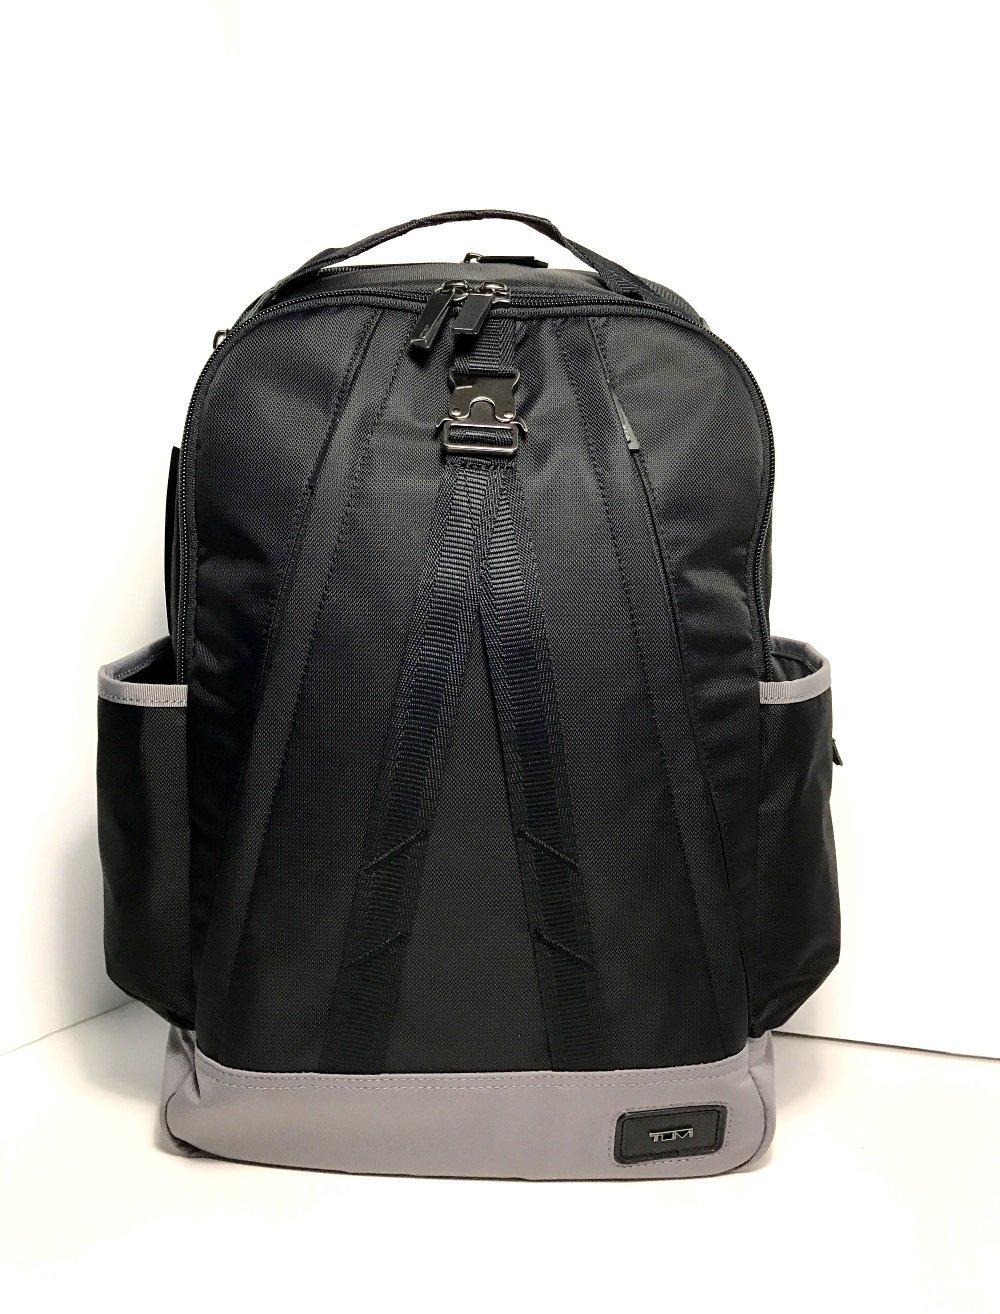 e34e9edd1 Cheap Ducati Tumi Backpack, find Ducati Tumi Backpack deals on line ...